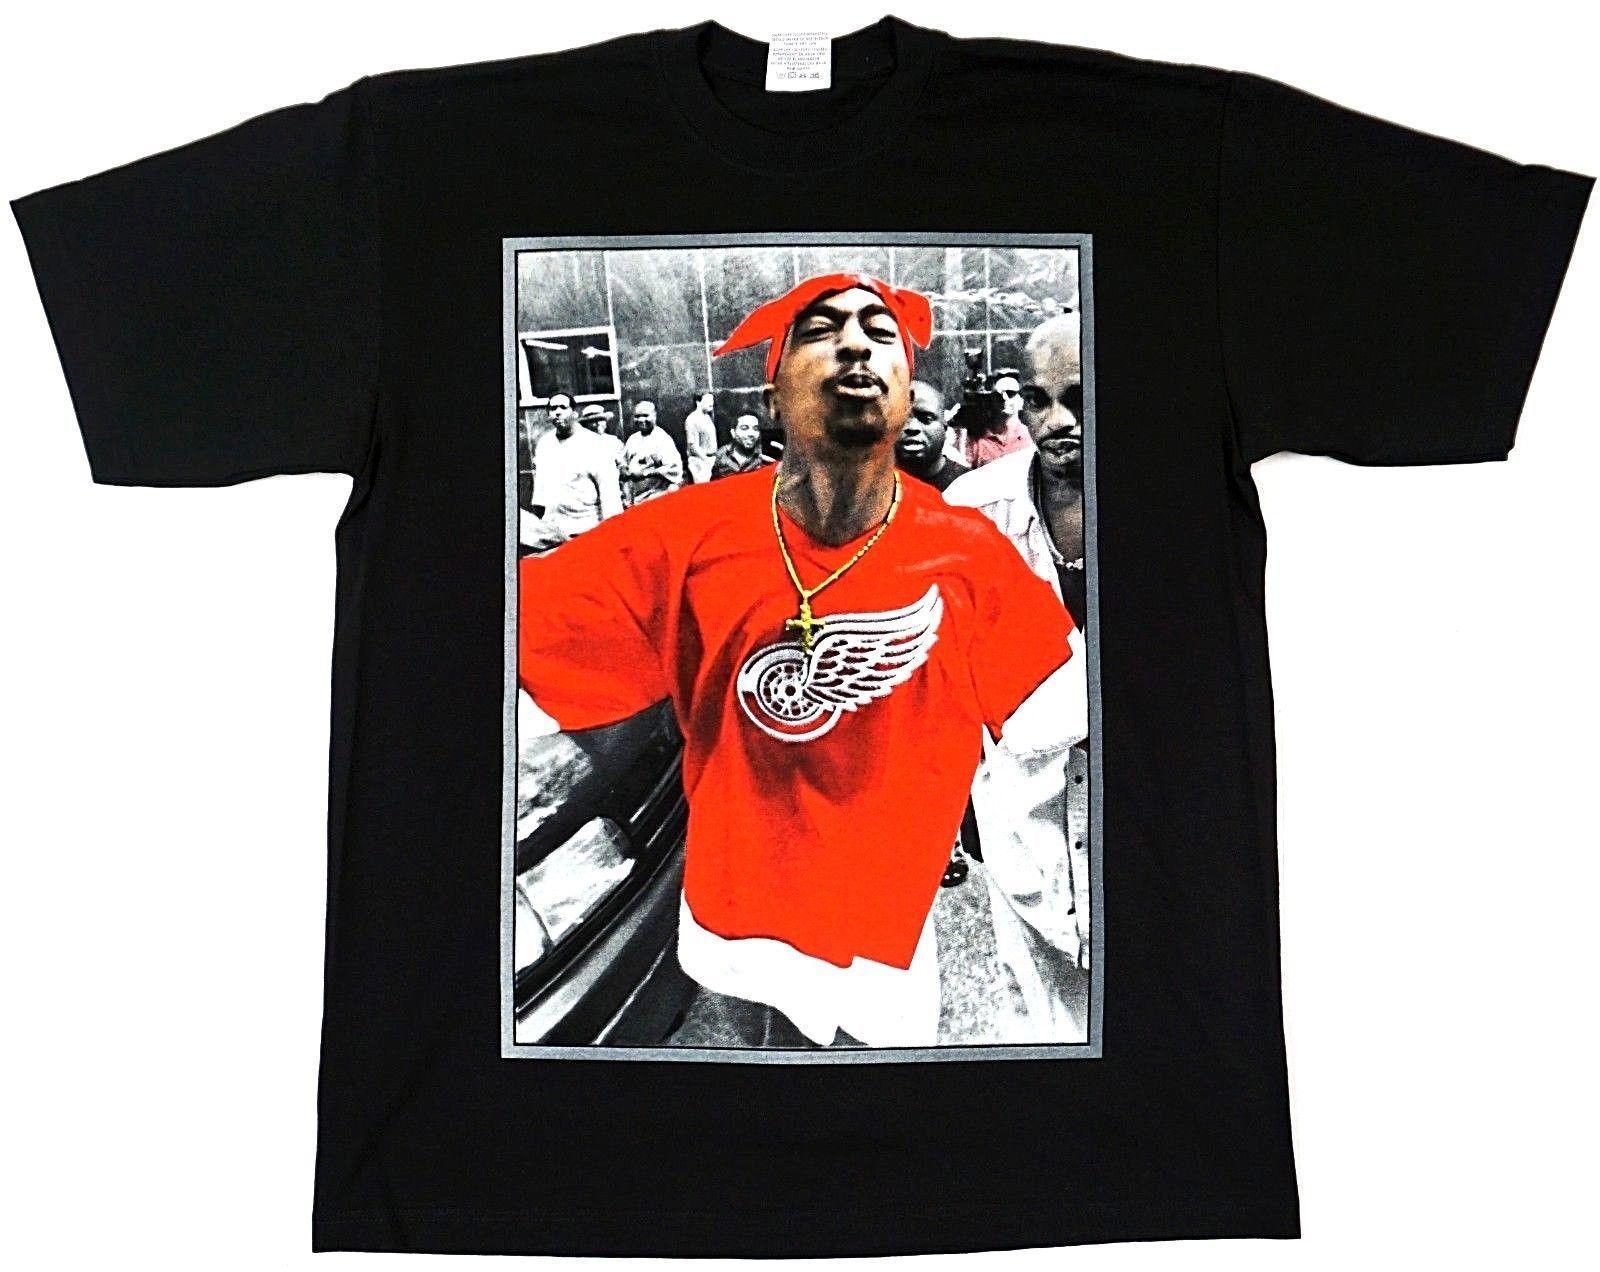 Grosshandel Tupac Shakur T Shirt 2pac Verbrecher Red Wings Urban Hip